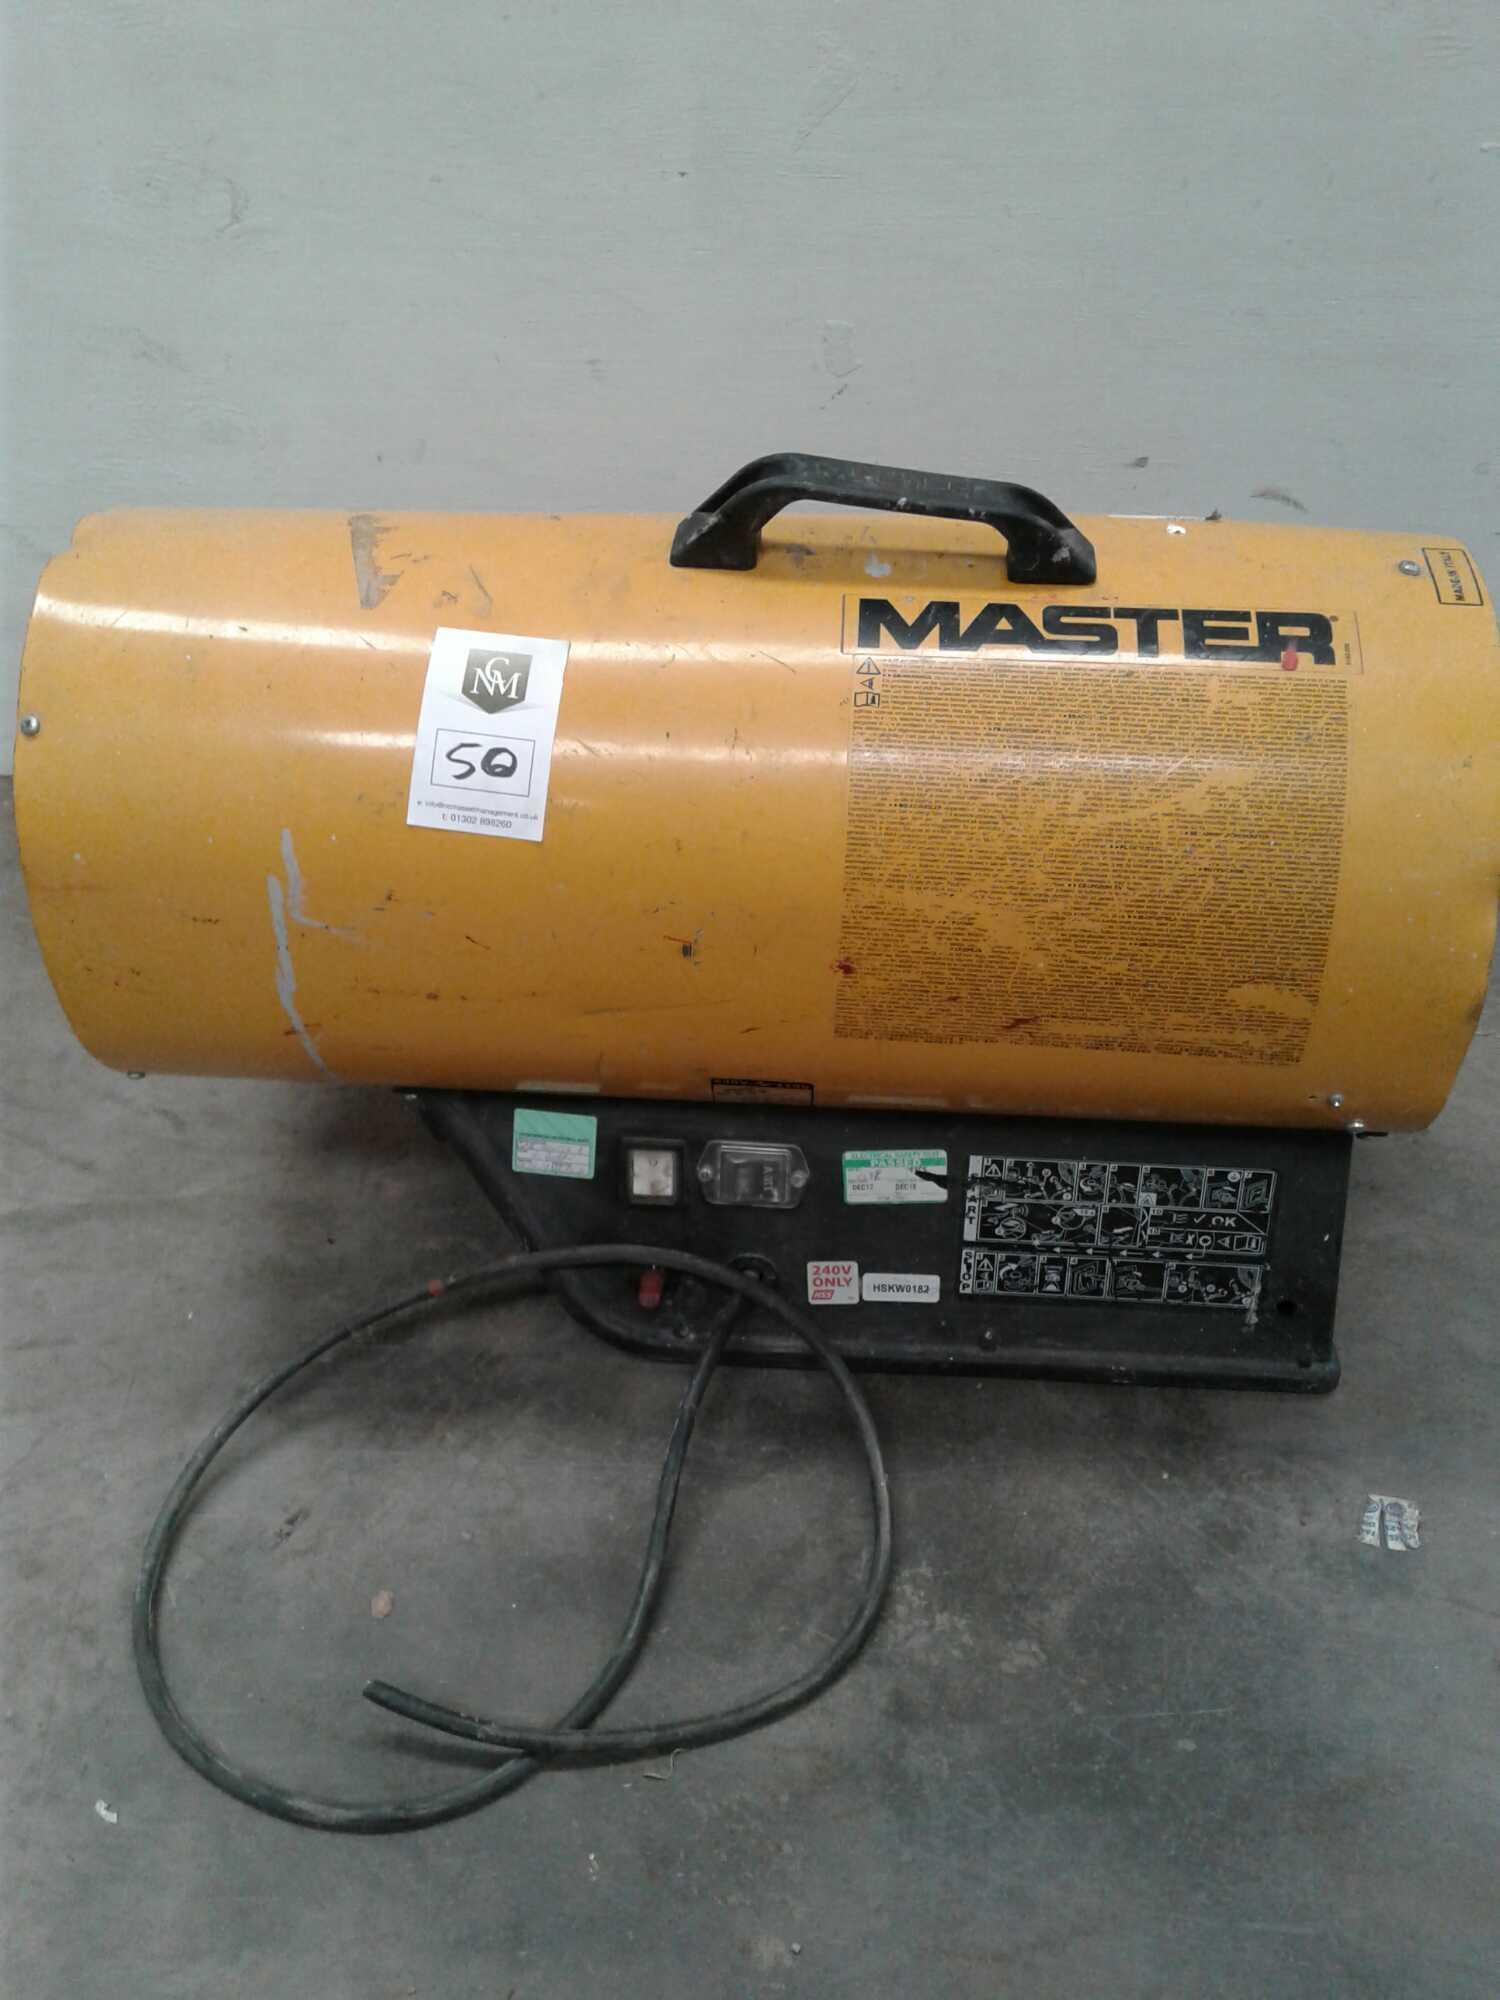 Lot 50 - Master space heater 240 V